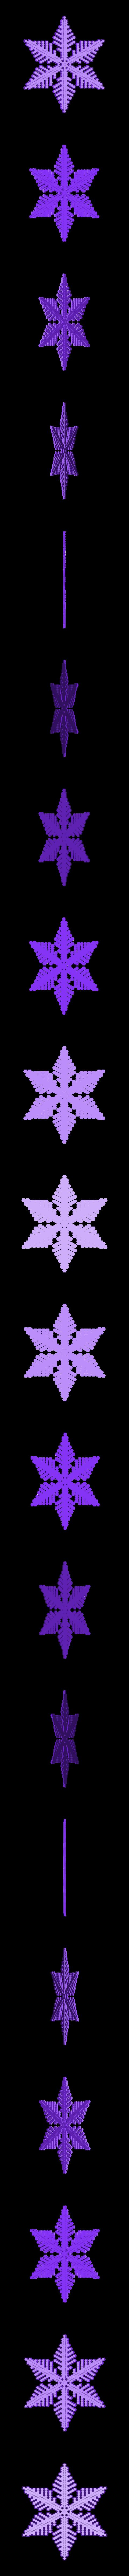 reiter40-3d.stl Download free STL file Snowflake growth simulation in BlocksCAD • 3D printing design, arpruss